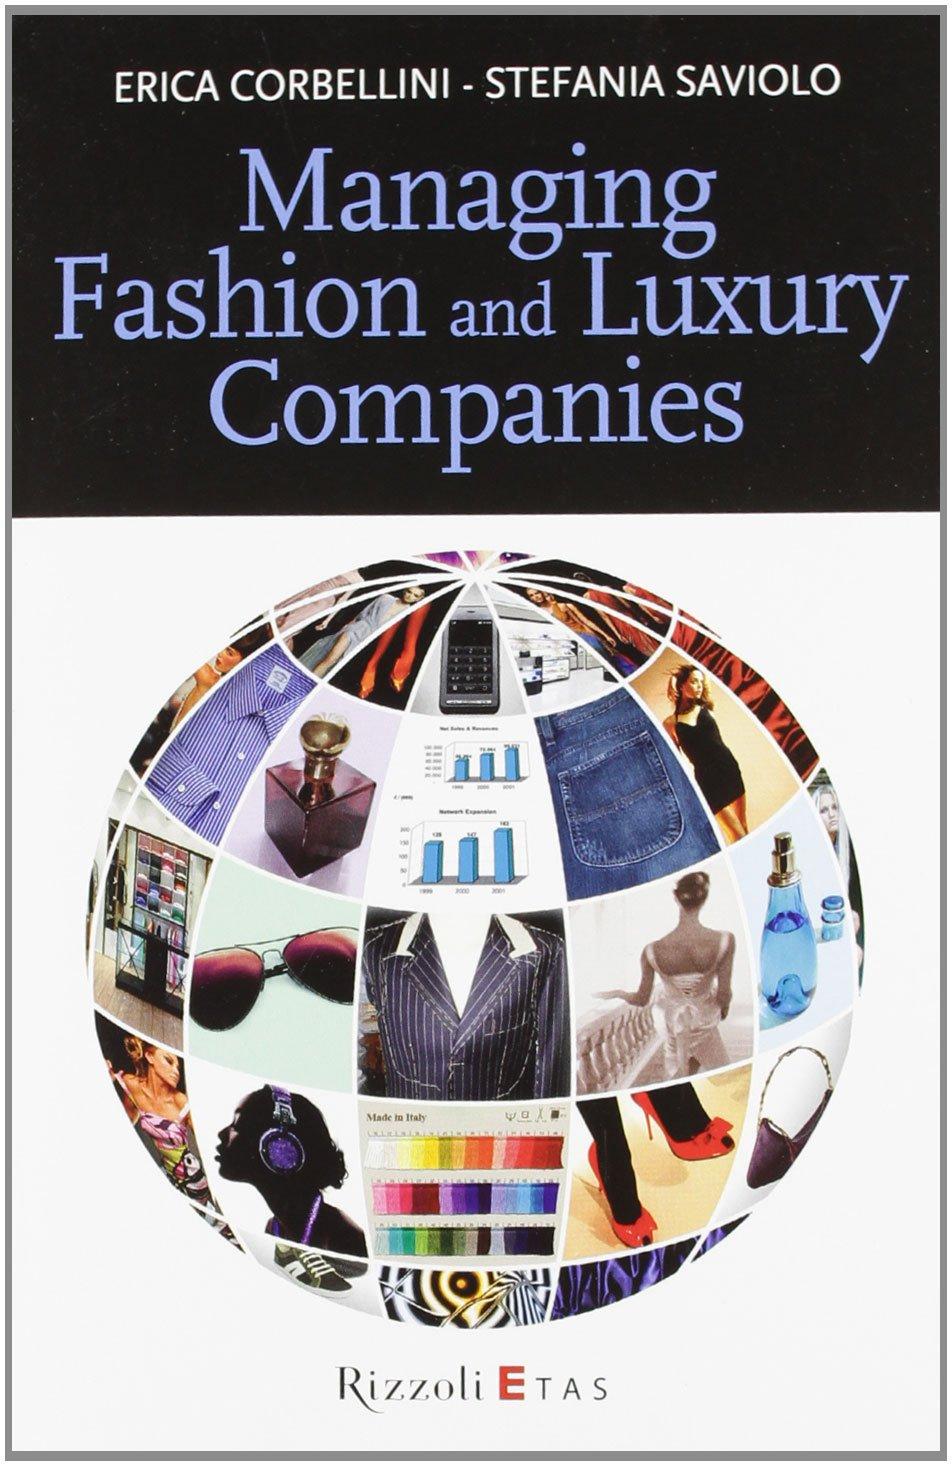 Managing fashion and luxury companies Copertina flessibile – 18 feb 2009 Erica Corbellini Stefania Saviolo Rizzoli Etas 8817061654